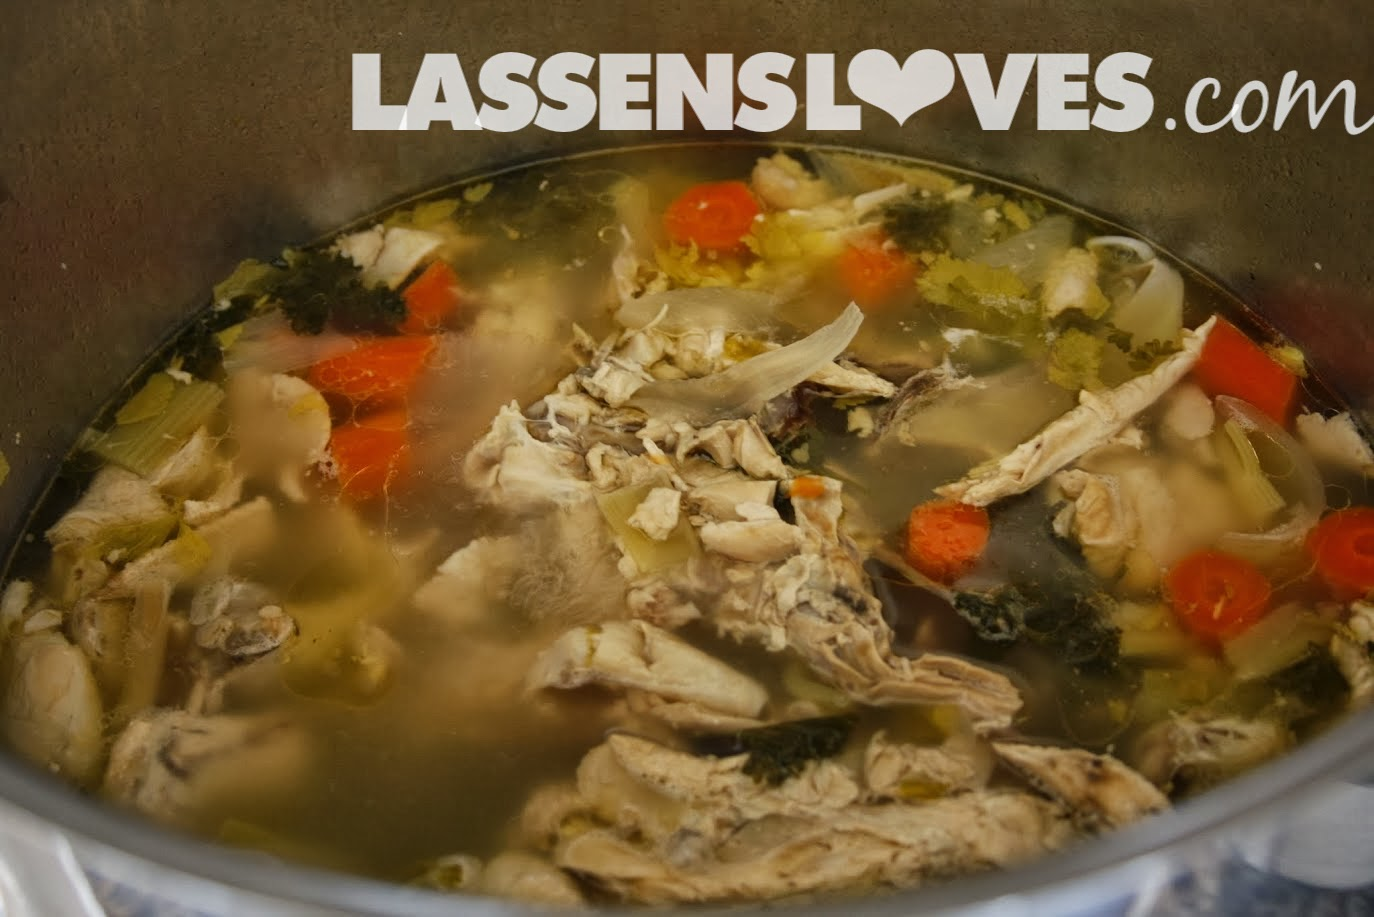 lassensloves.com, Lassen's, Chicken+broth+ingredients, Chicken+soup